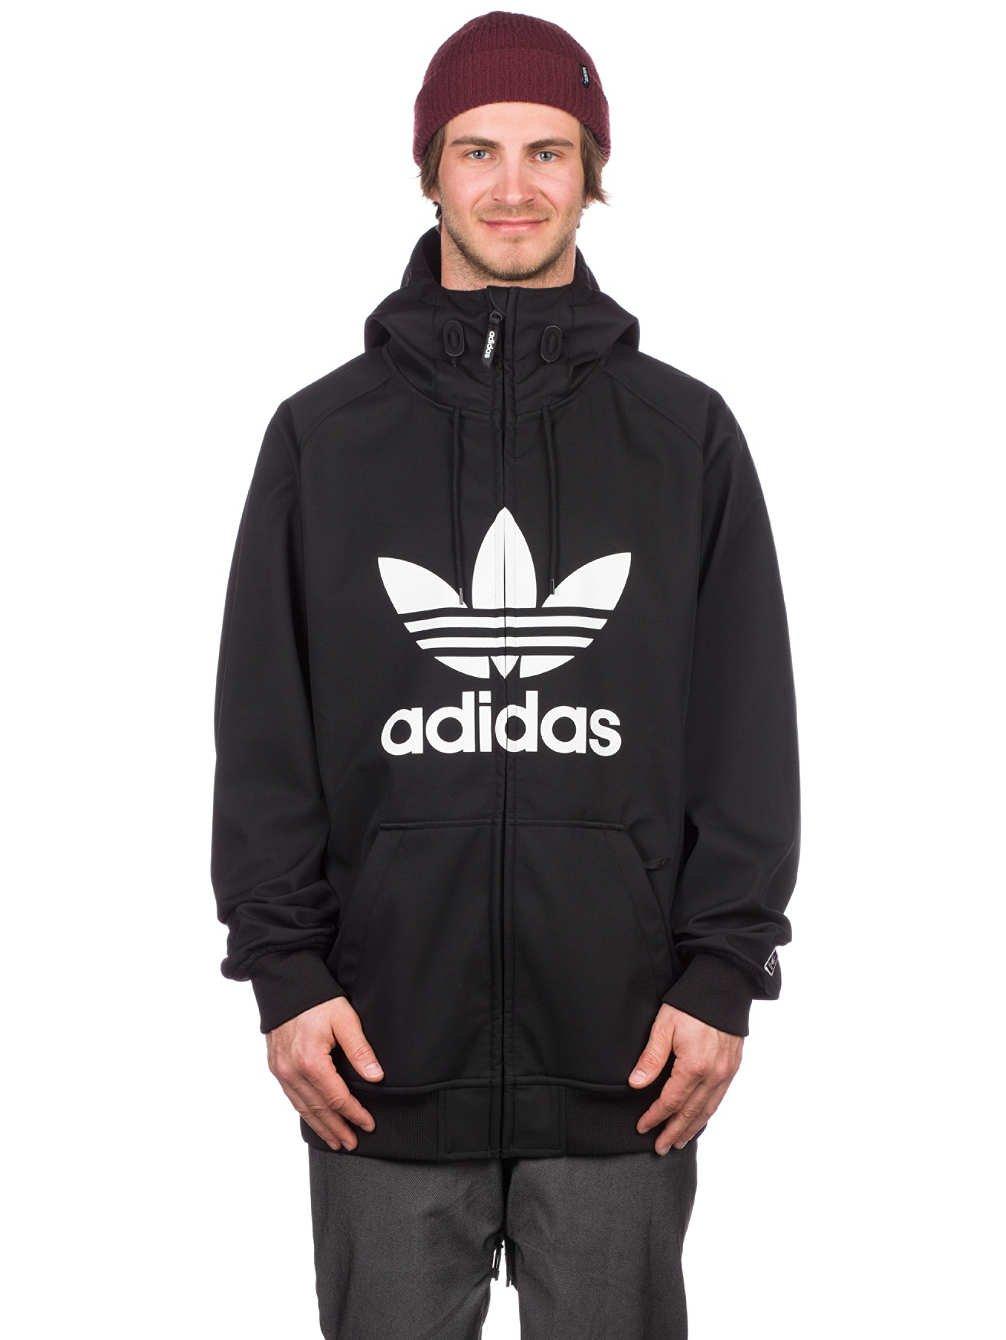 adidas Herren Snowboard Jacke Snowboarding Greeley Soft Shell Jacke